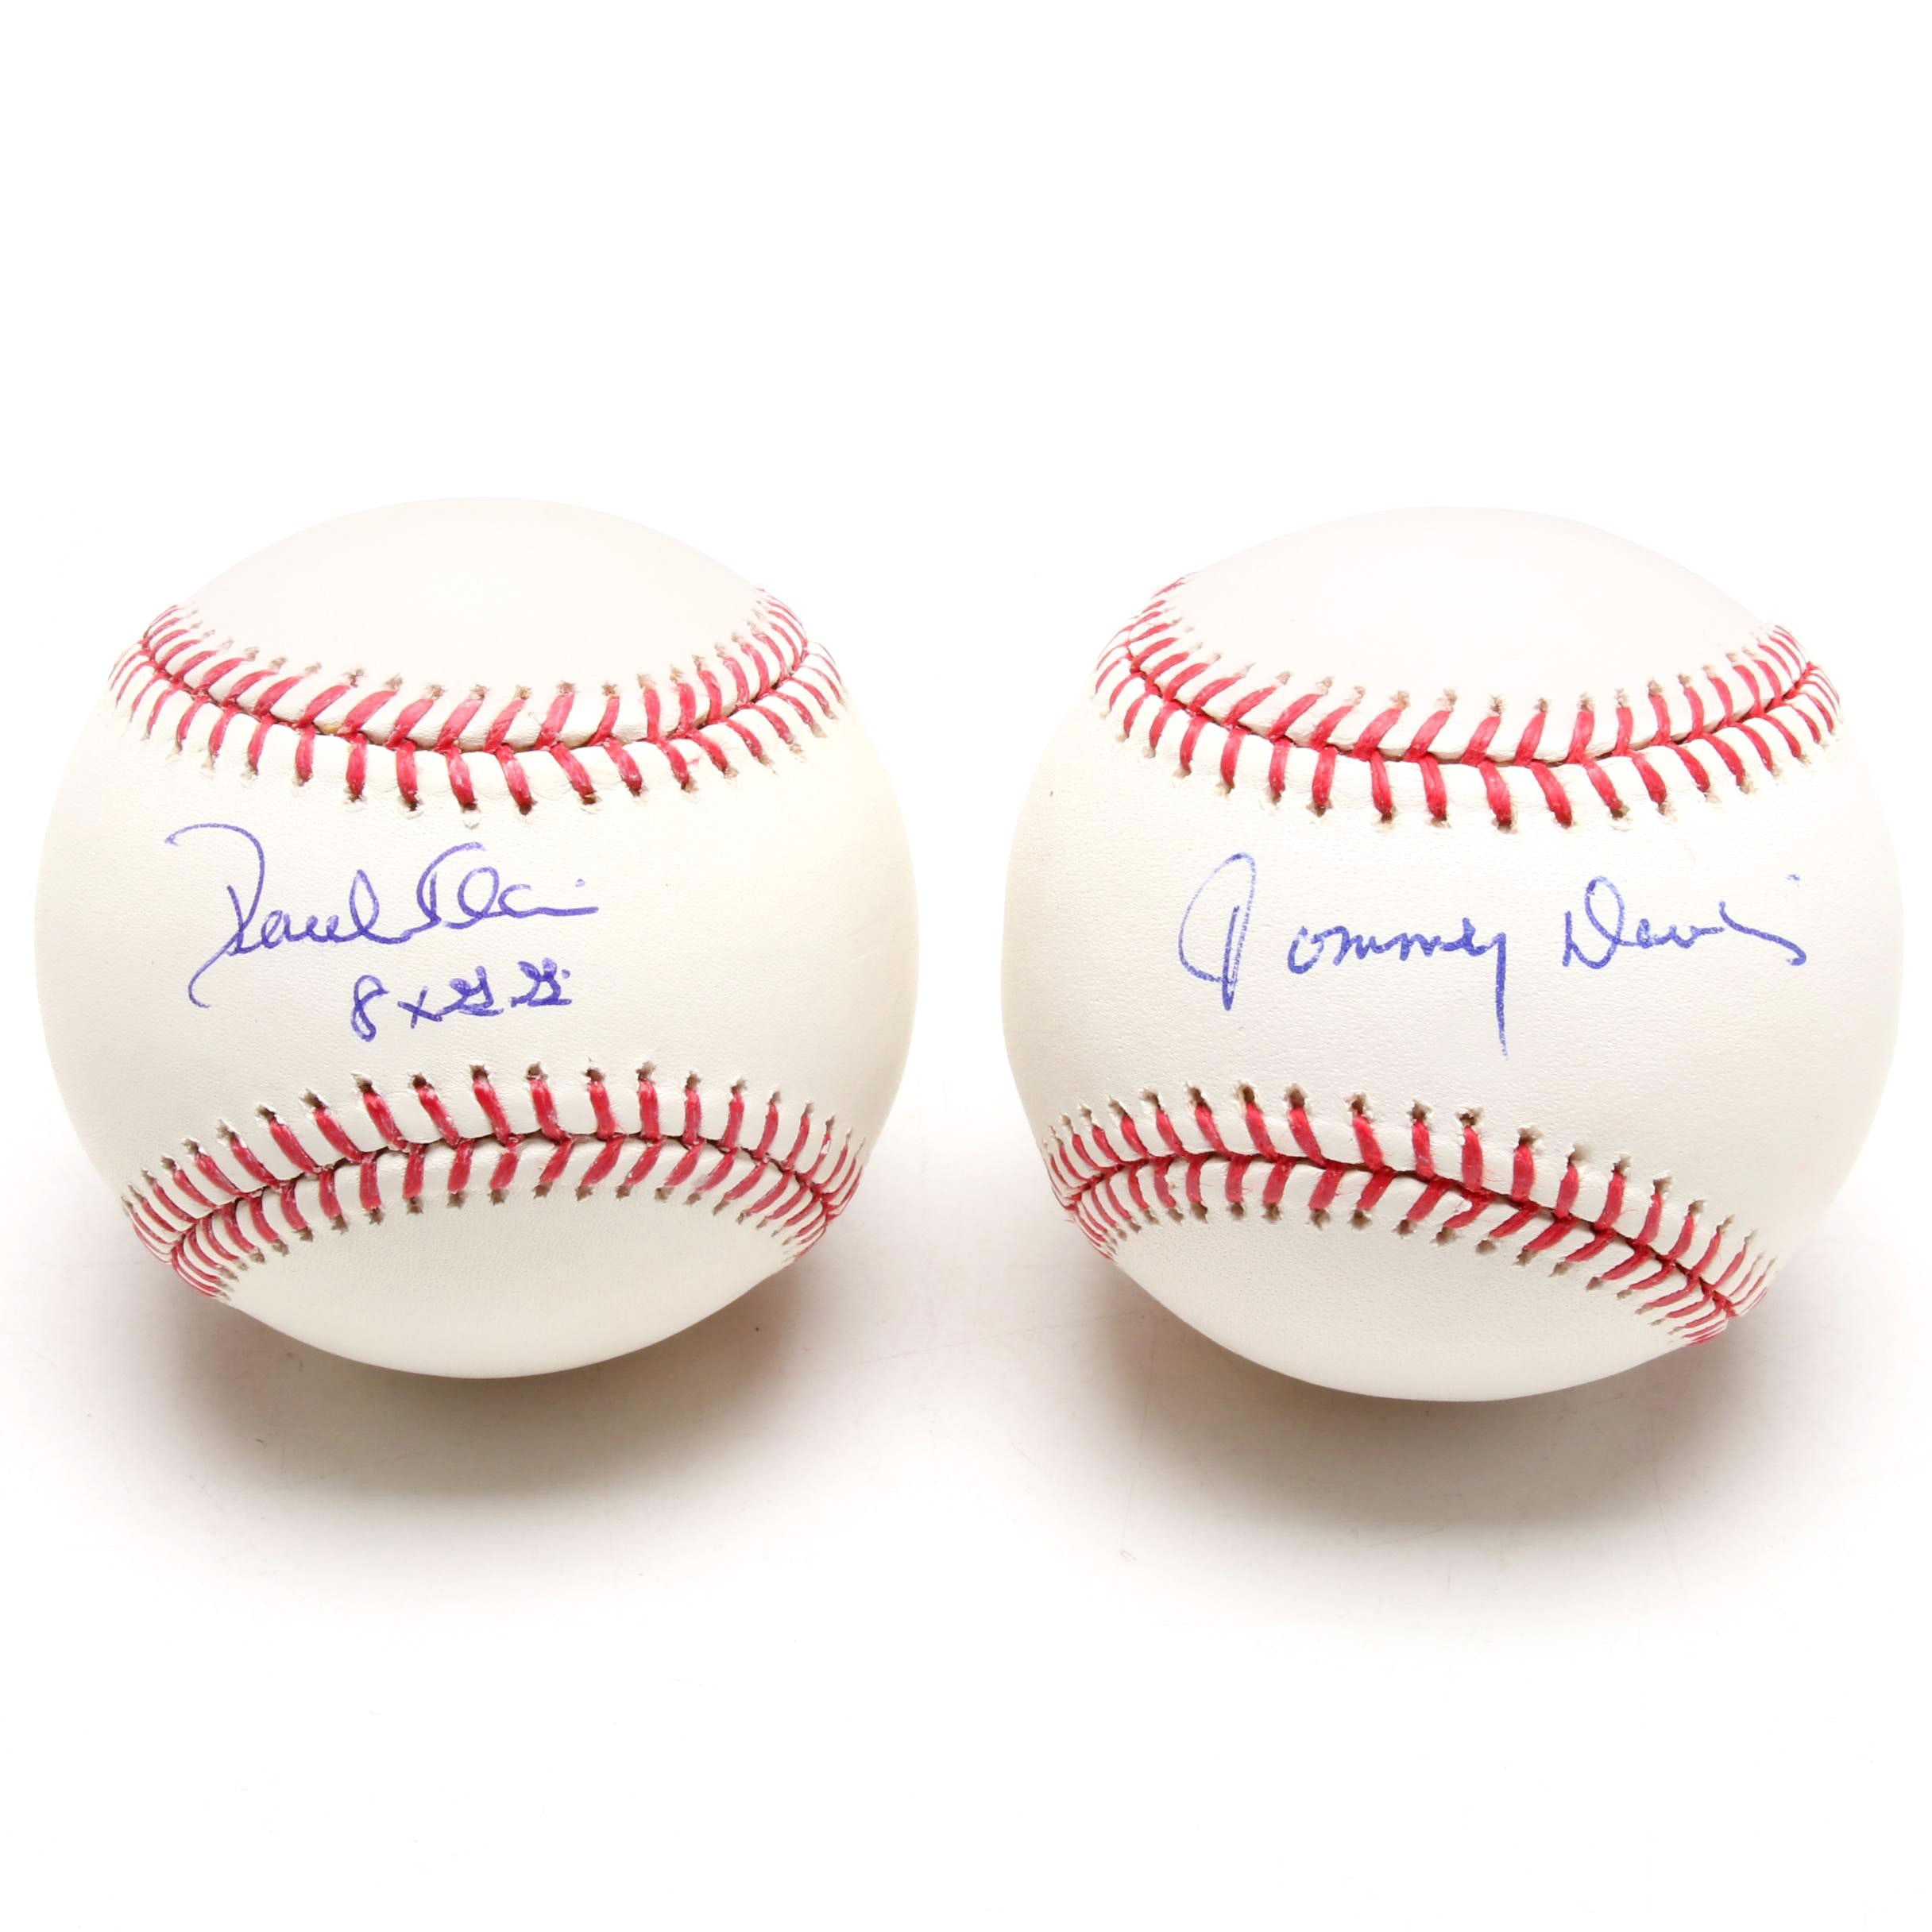 Paul Blair and Tommy Davis Signed Rawlings Major League Baseballs